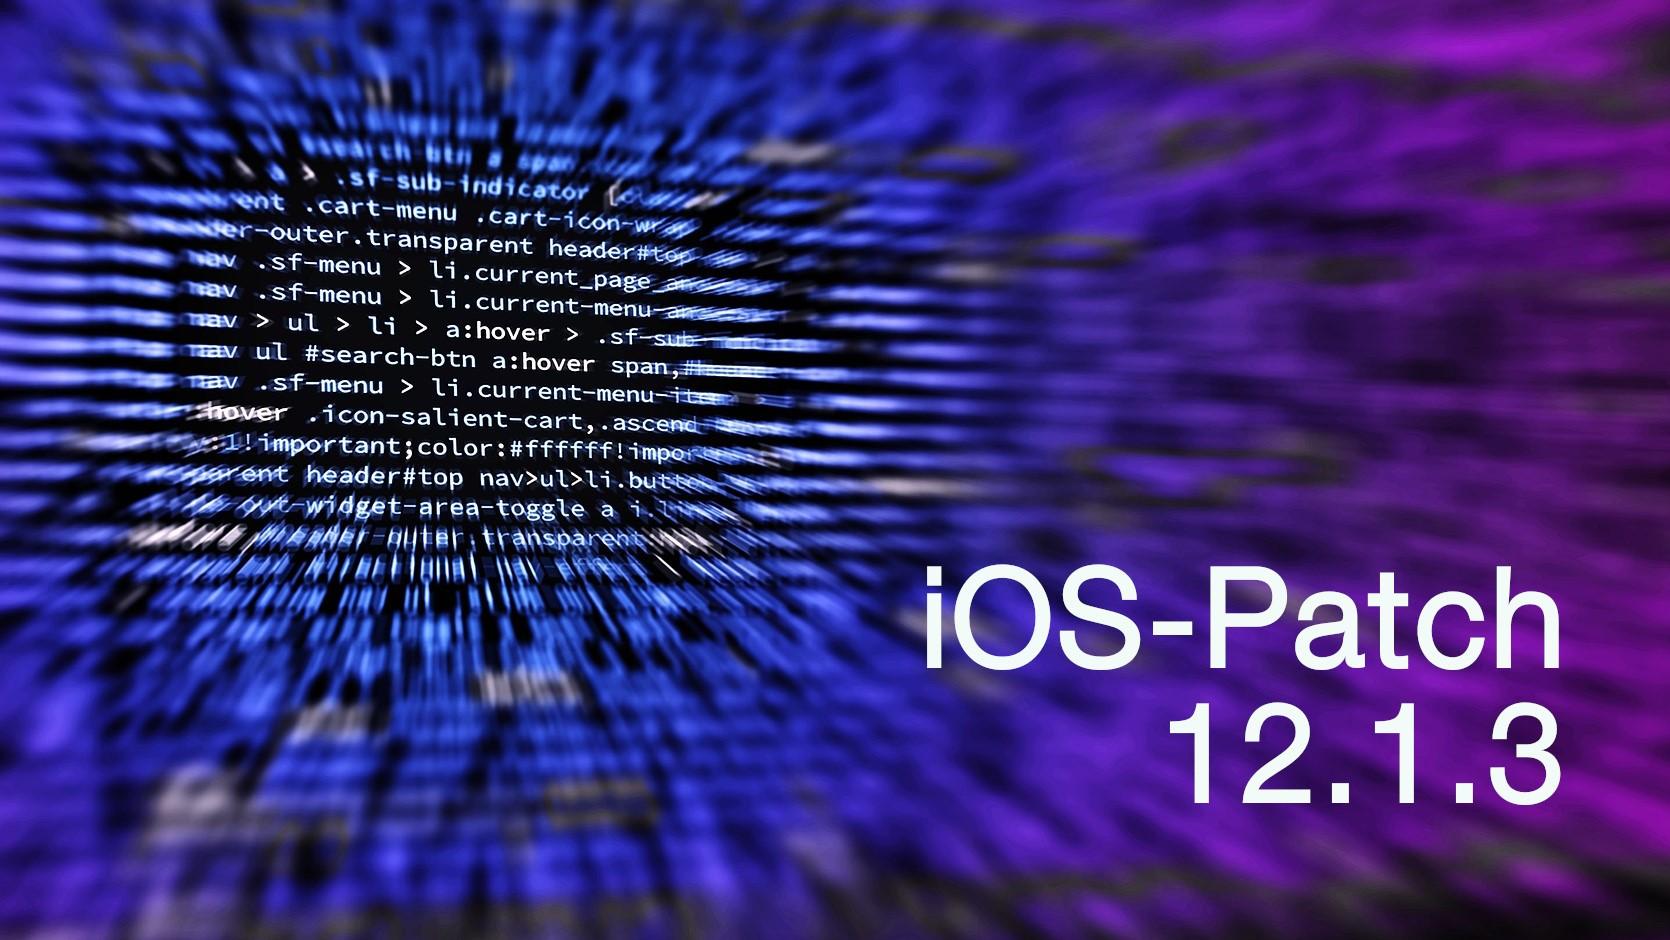 Gehackte iPhones: mobile Sicherheitslücken bei Apple